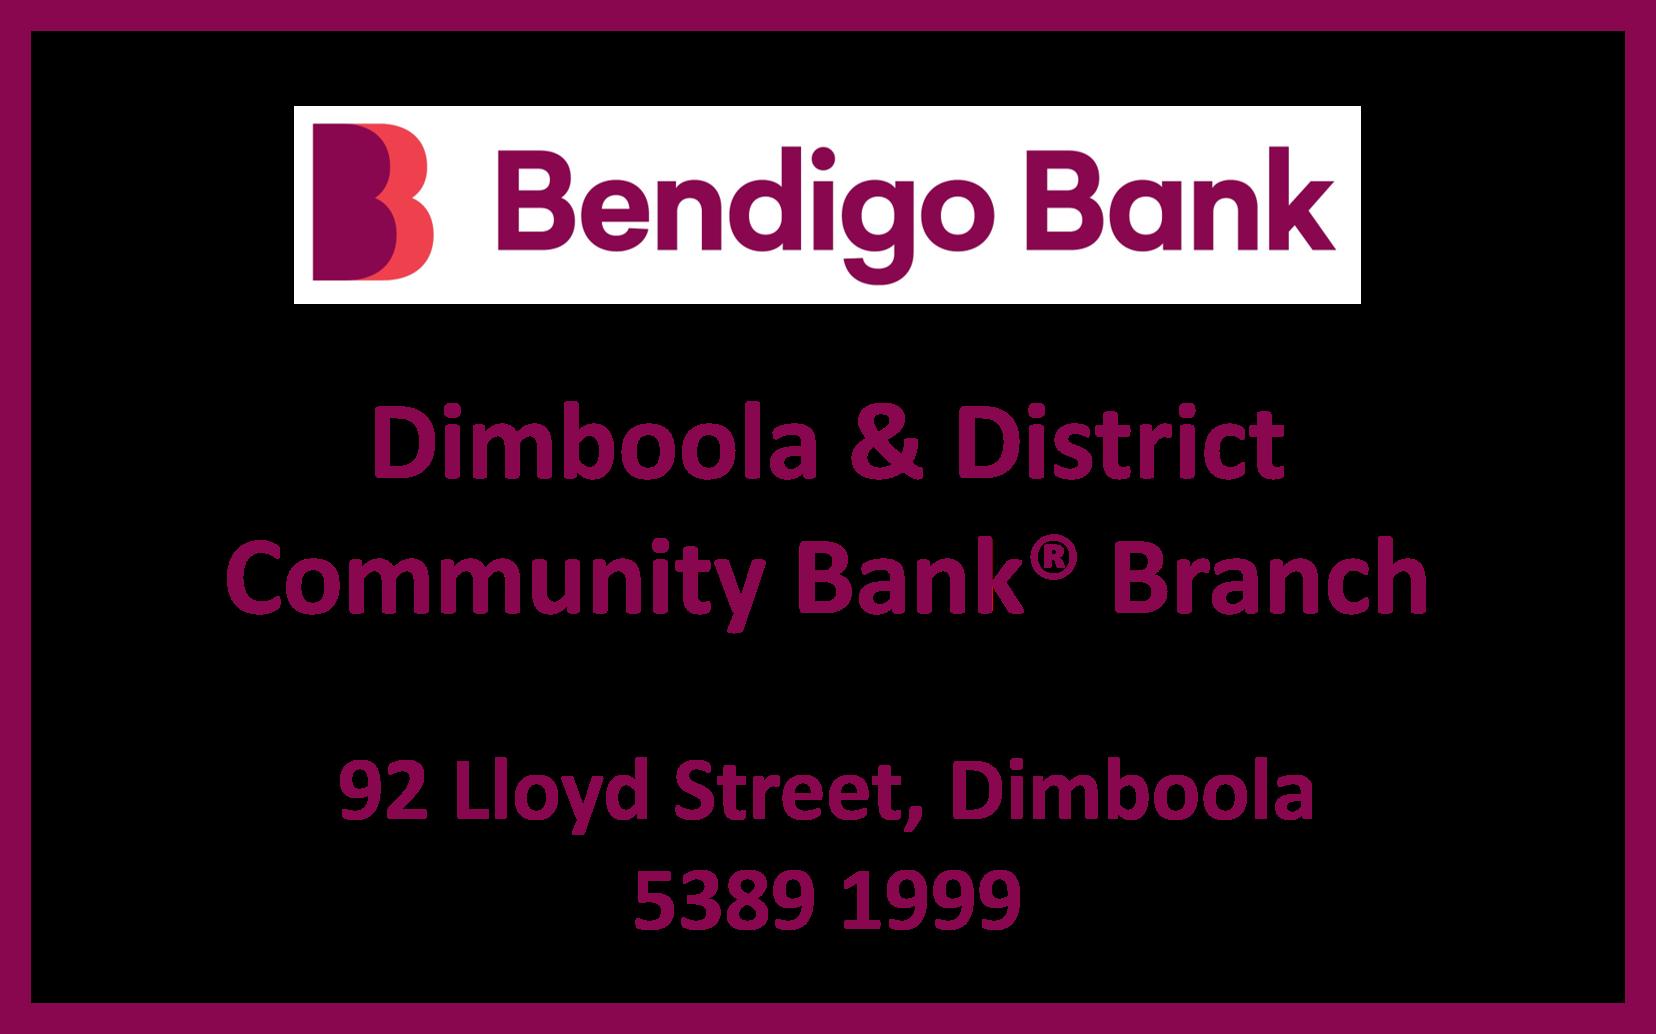 Bendigo Bank Dimboola & District Community Bank Branch